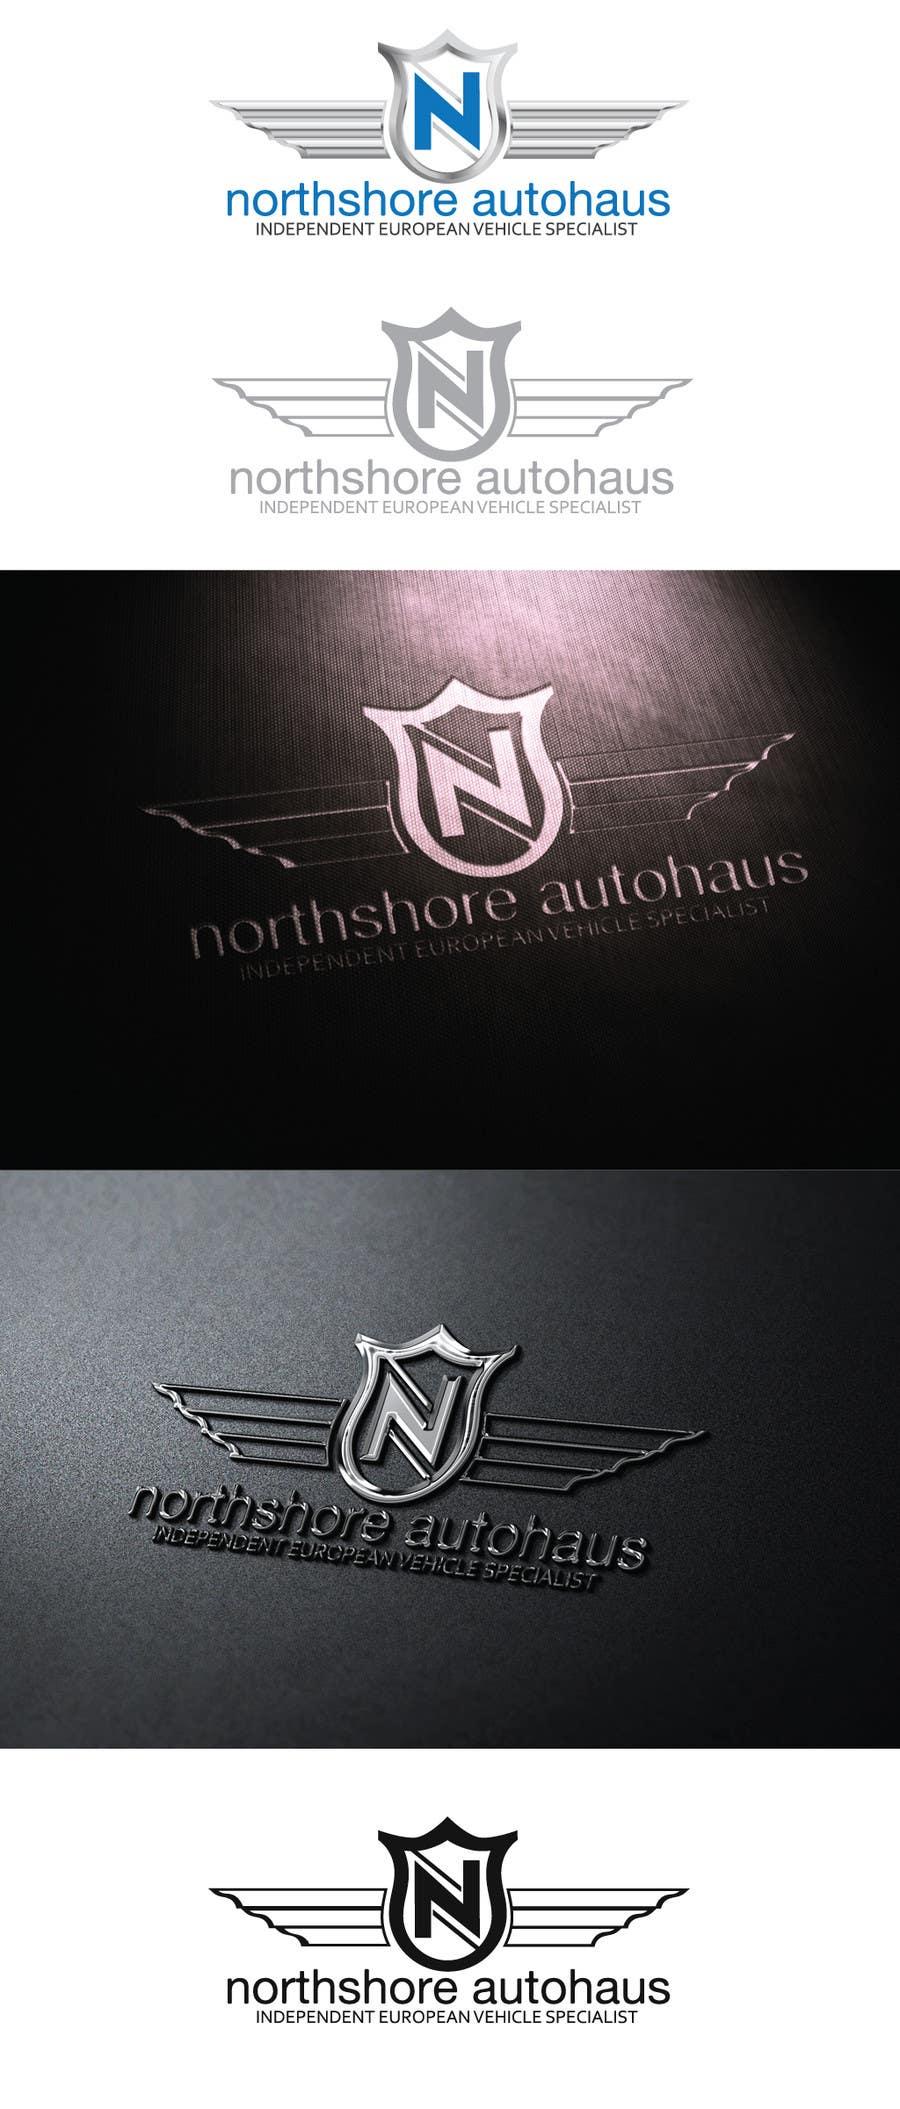 Bài tham dự cuộc thi #13 cho Logo Design for northshore autohaus